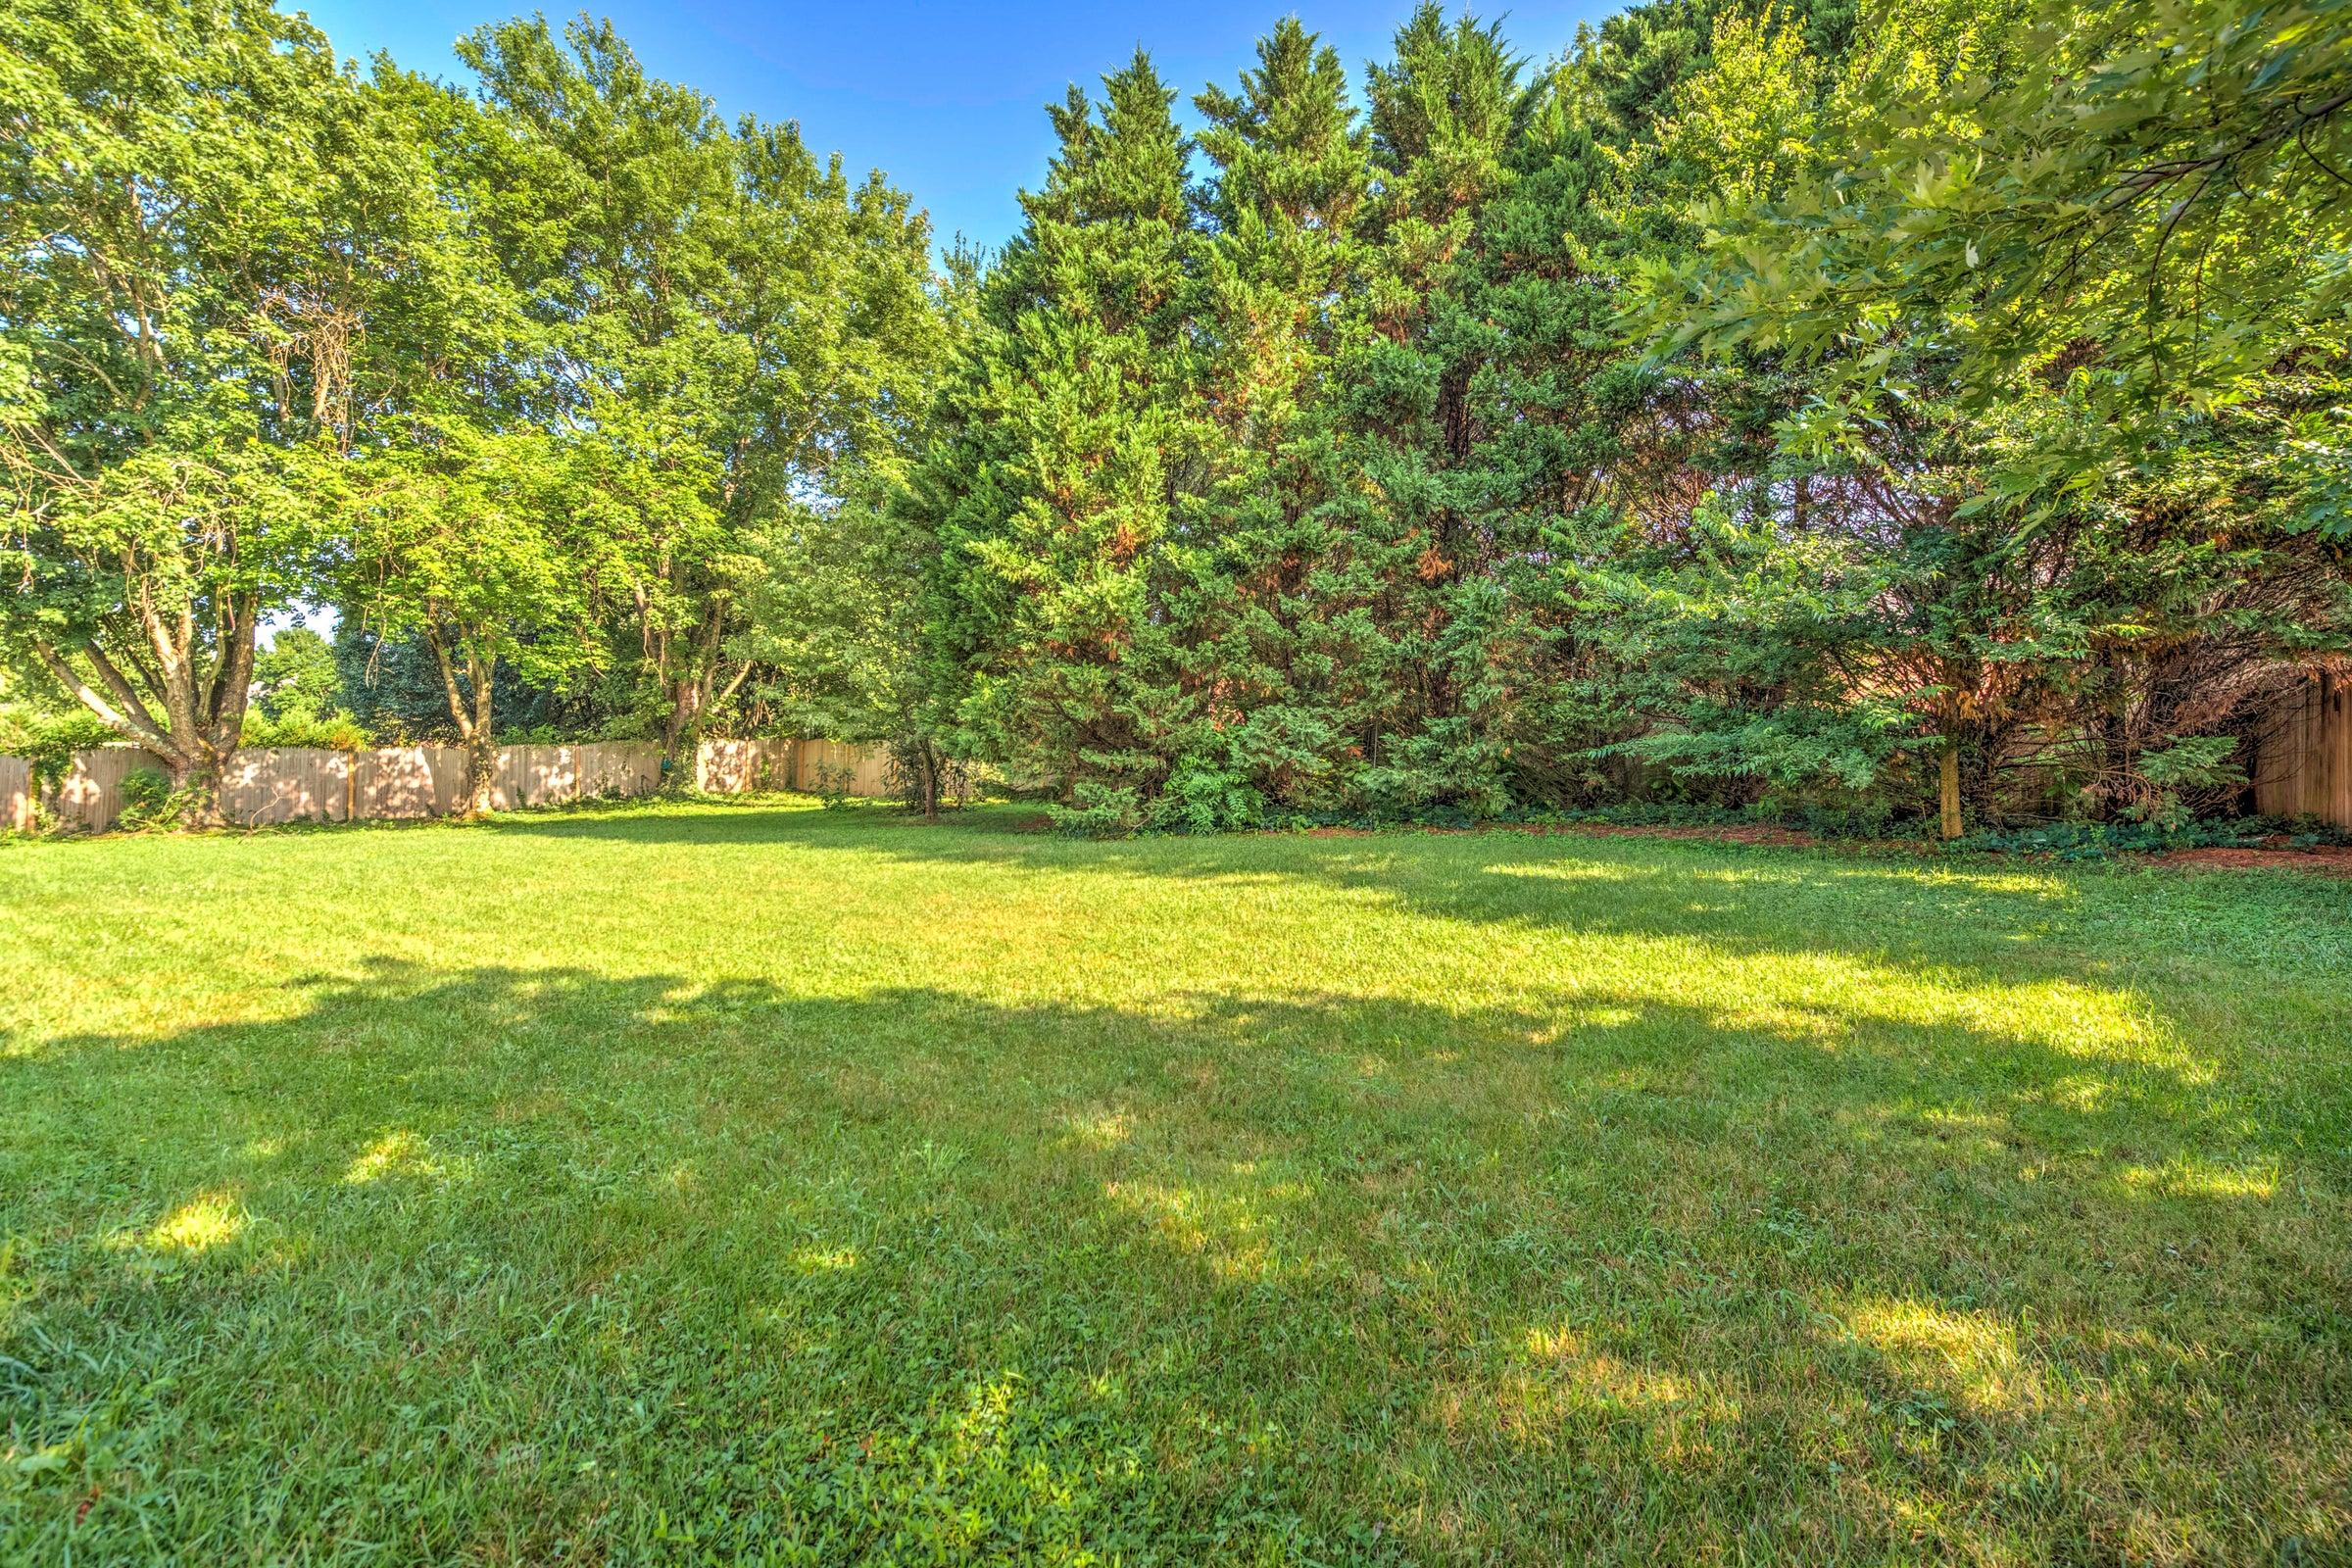 Flat Private Backyard